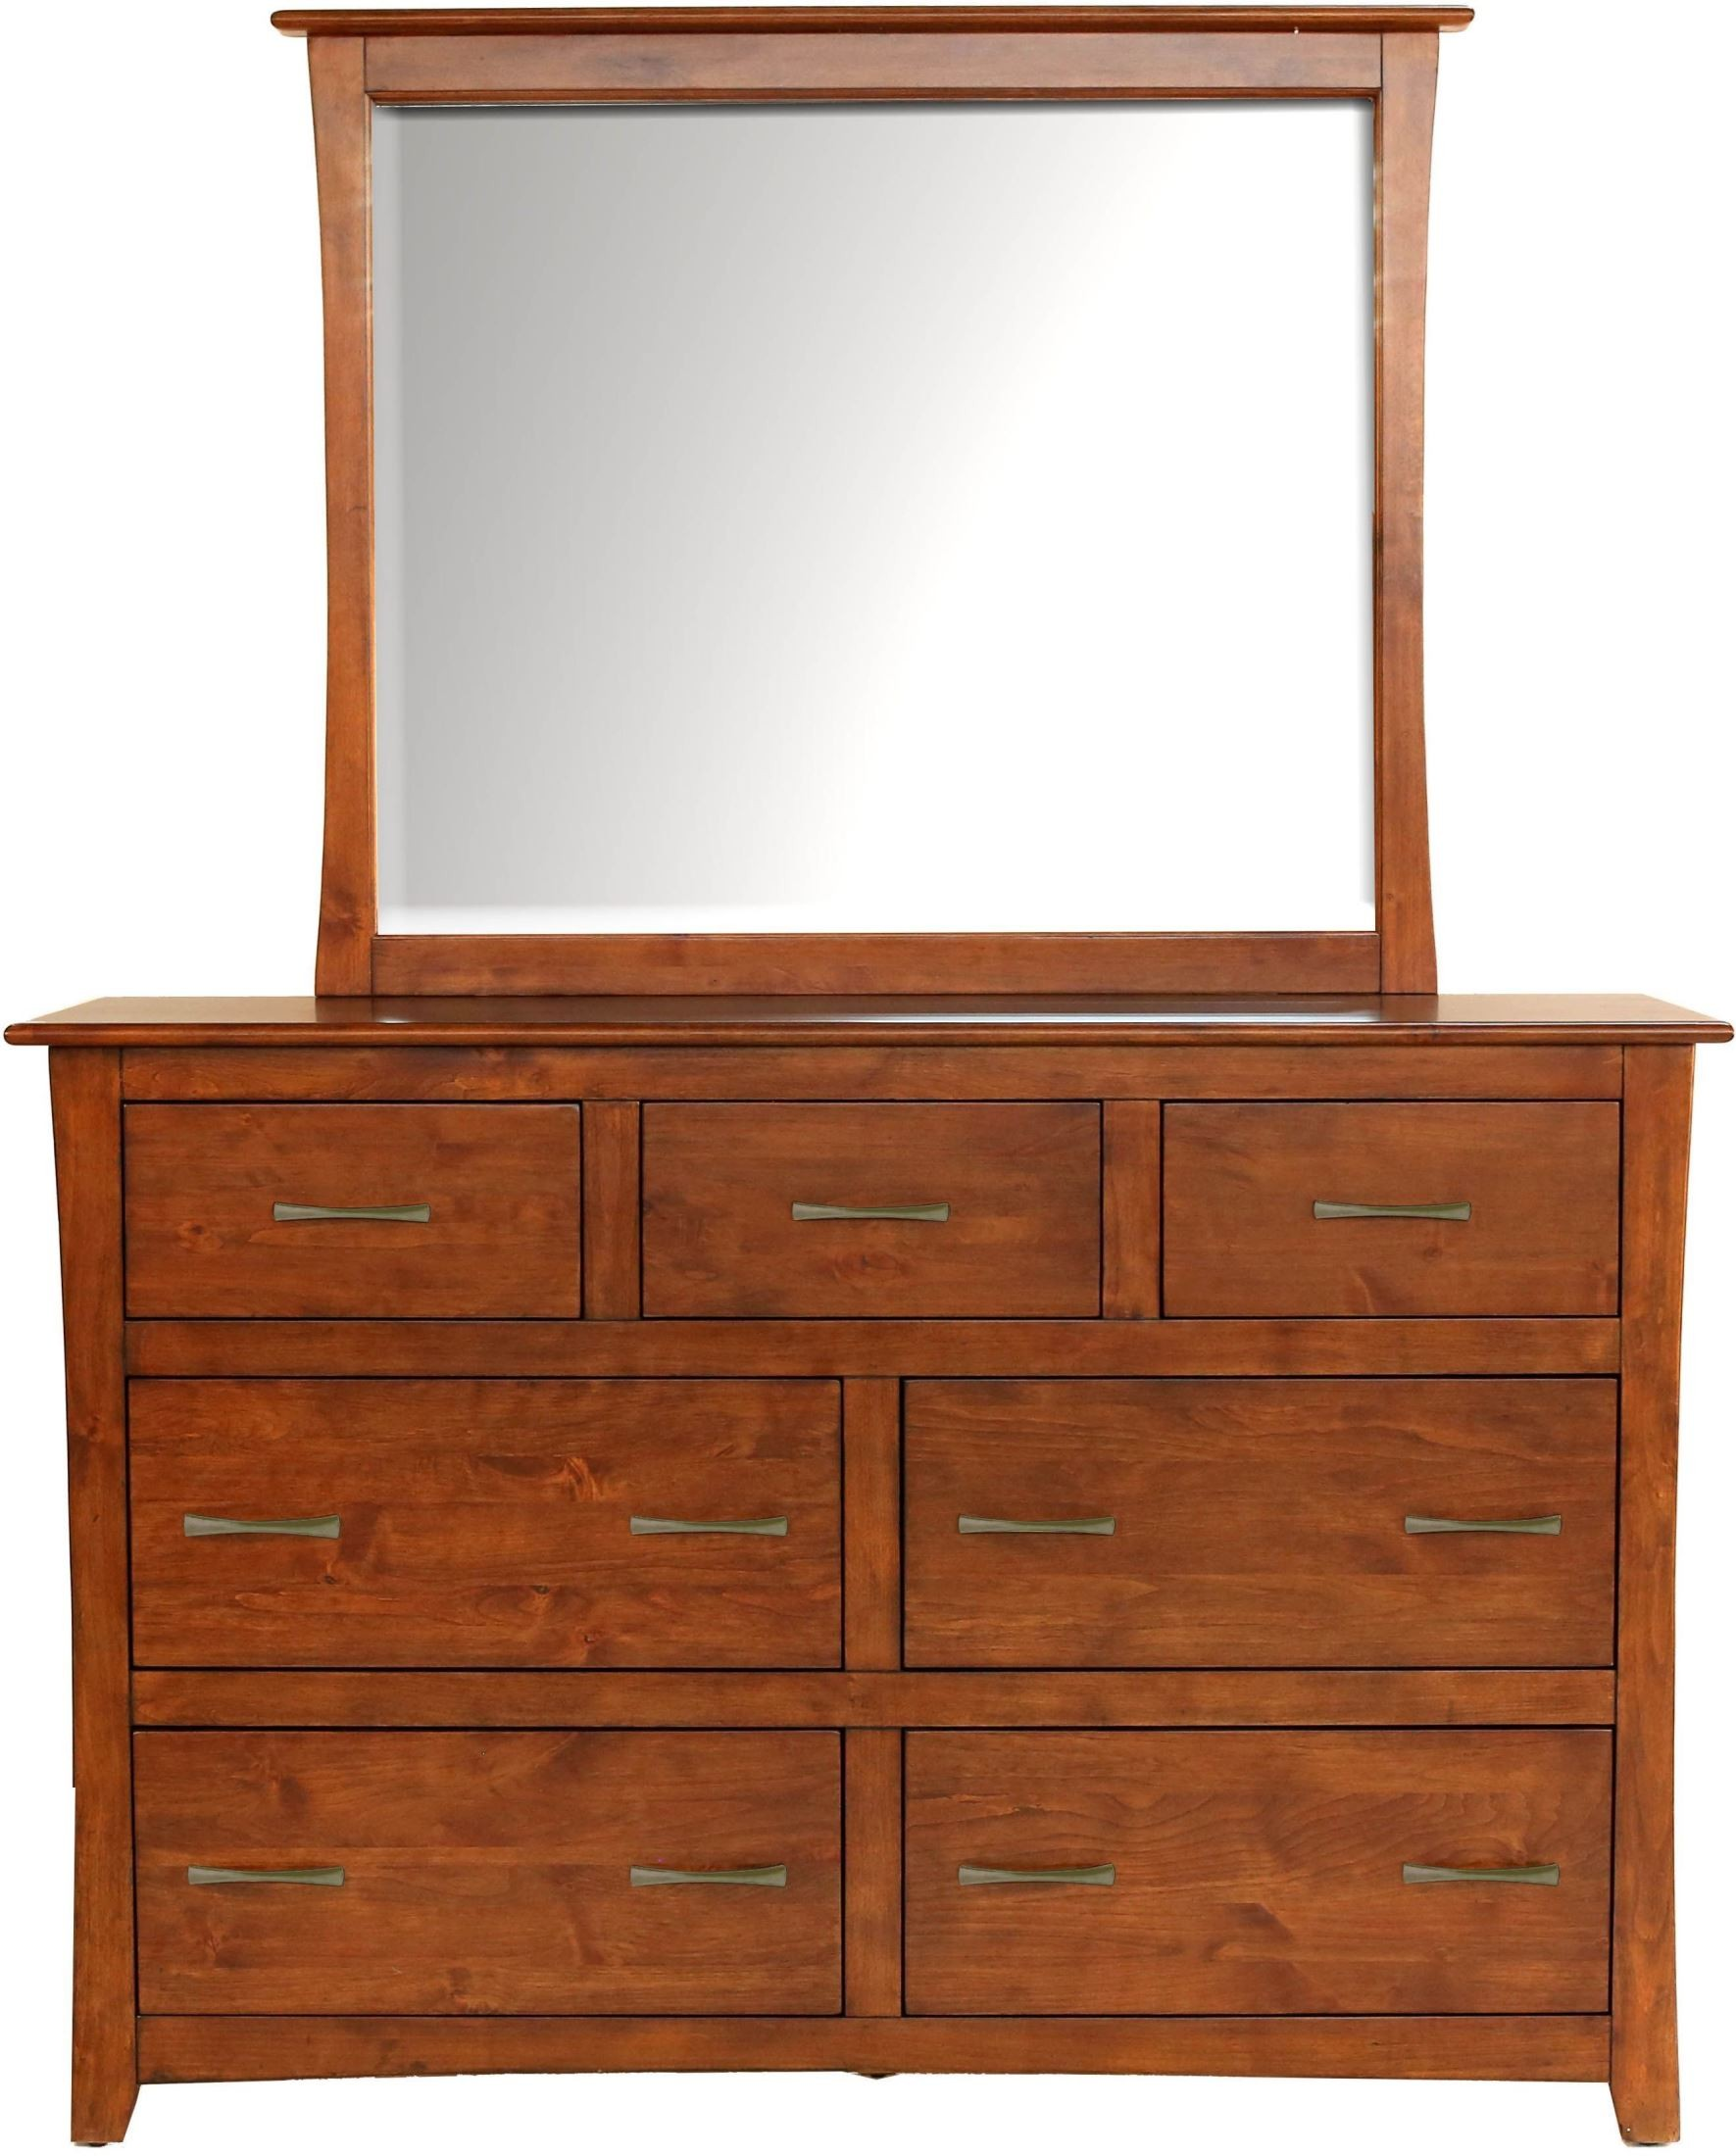 Grant Park Pecan Storage Bedroom Set Gpkpe5031 A America